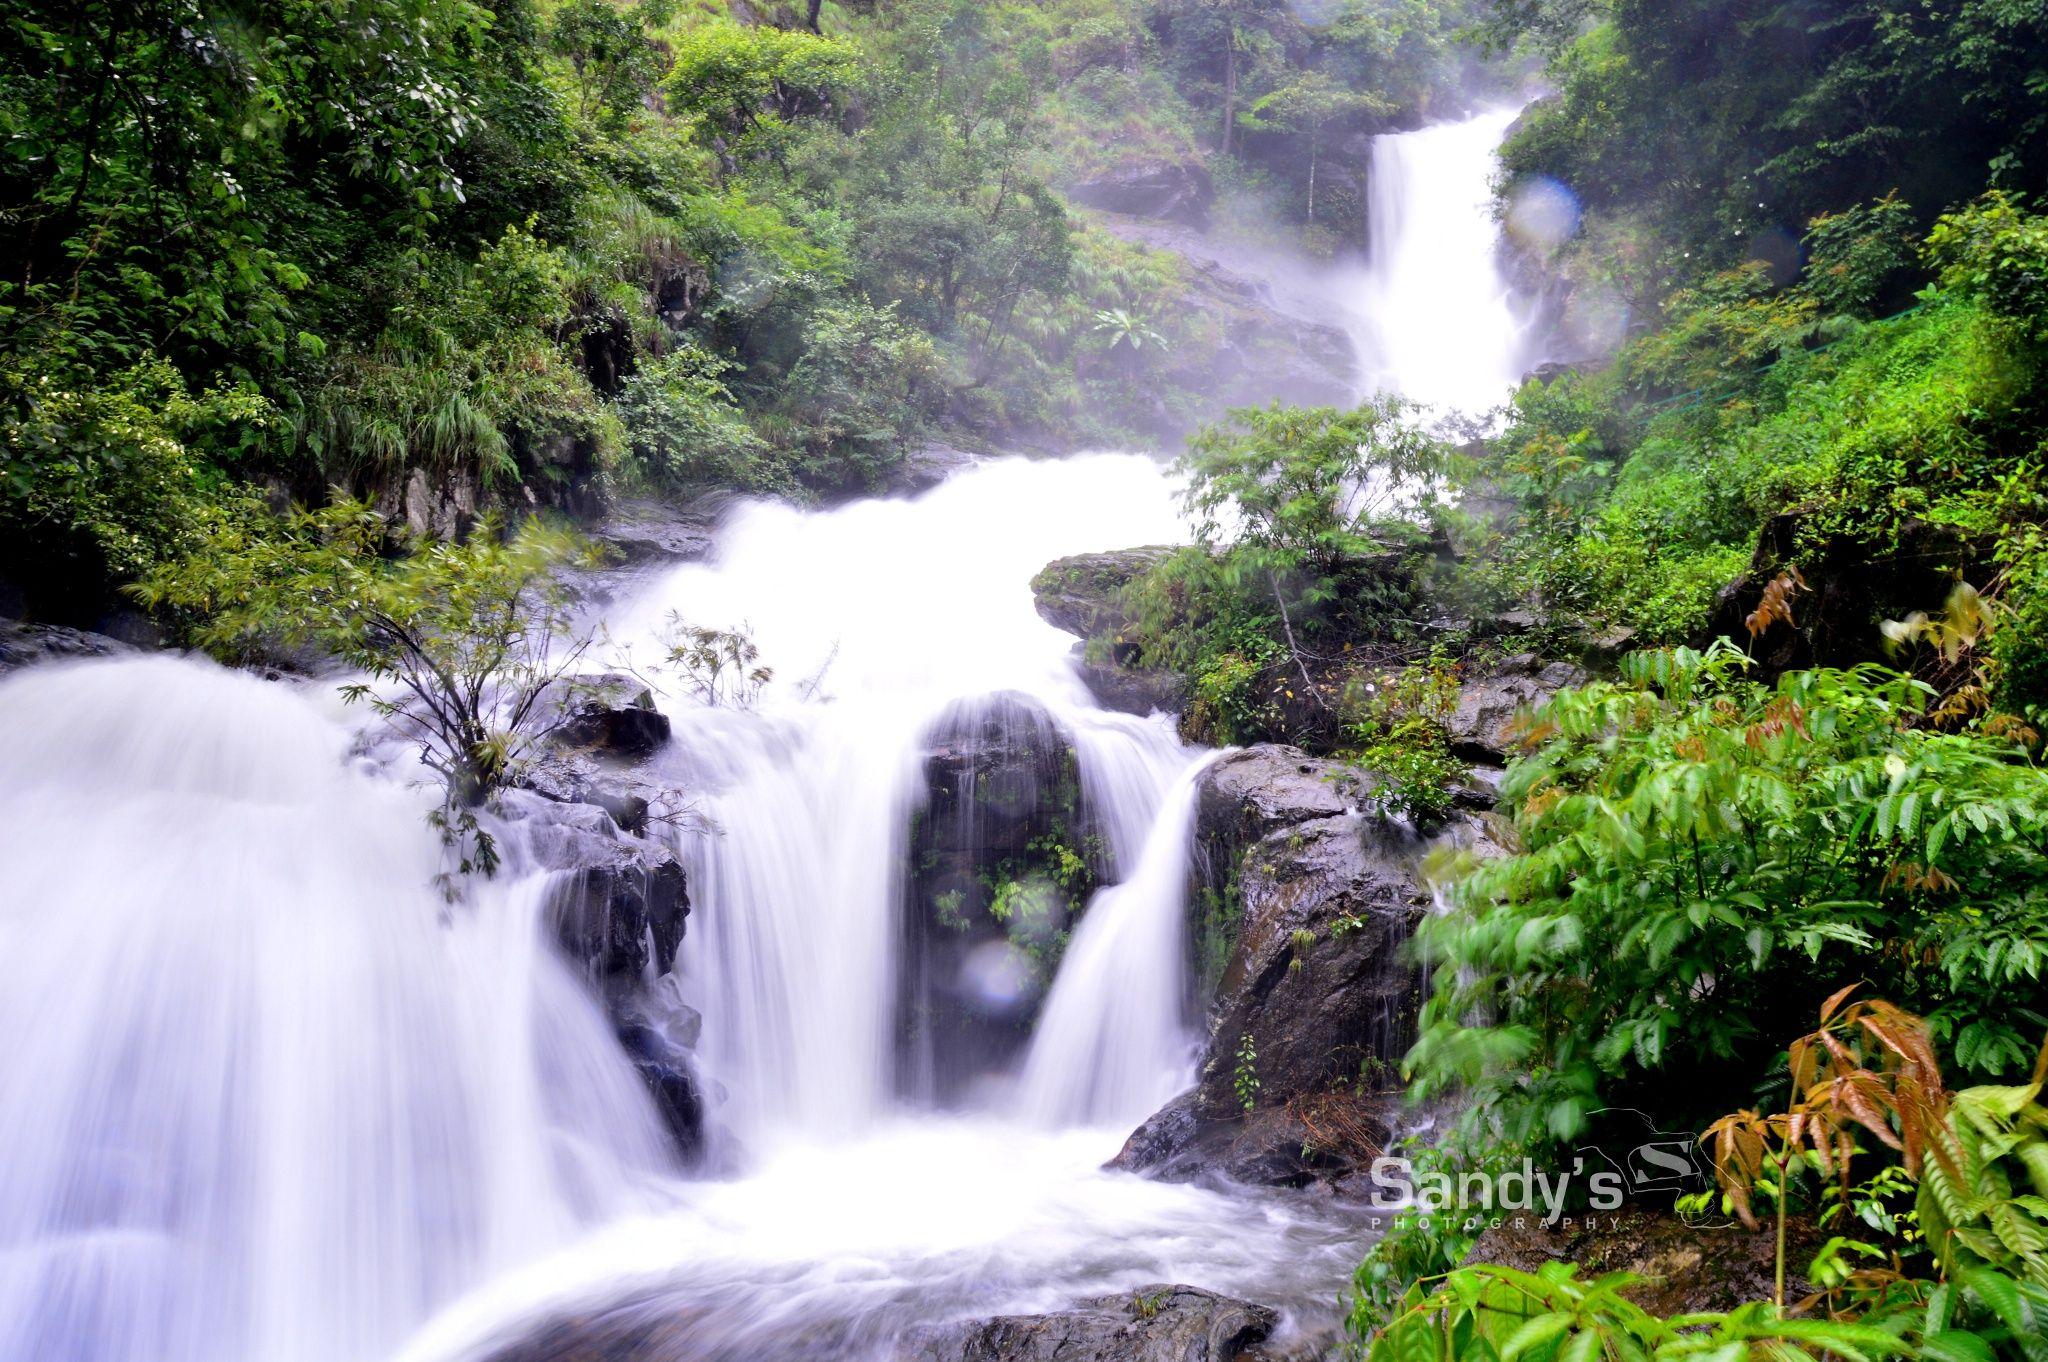 Photograph Iruppu Falls, Karnataka by Sandeep Surendran on